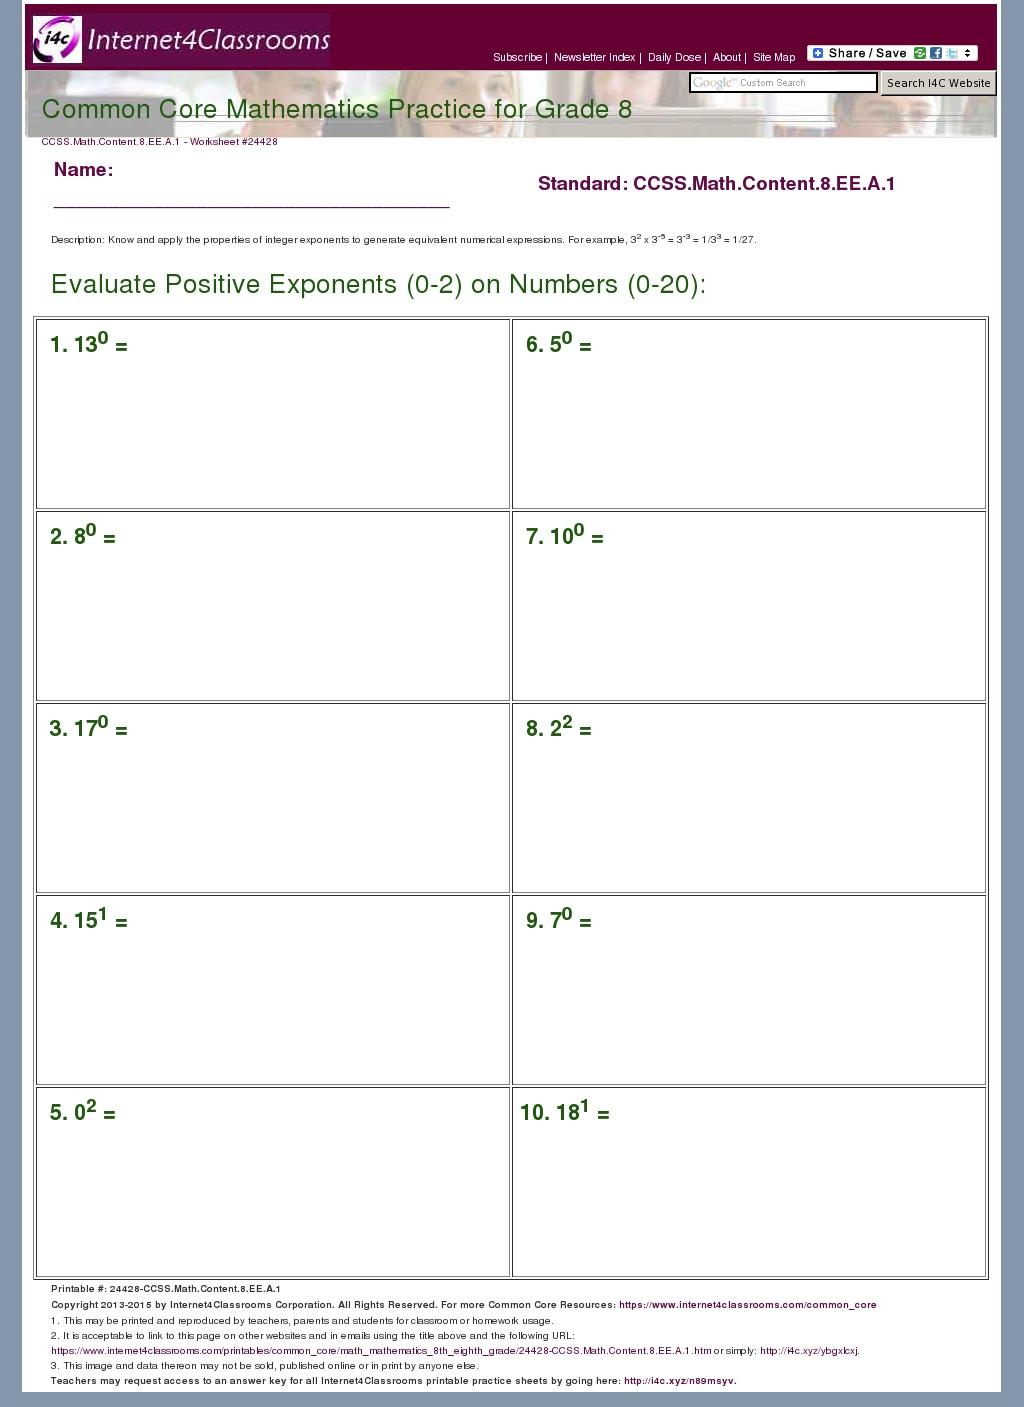 Common Core Standards Mathematics Worksheet 7th Grade